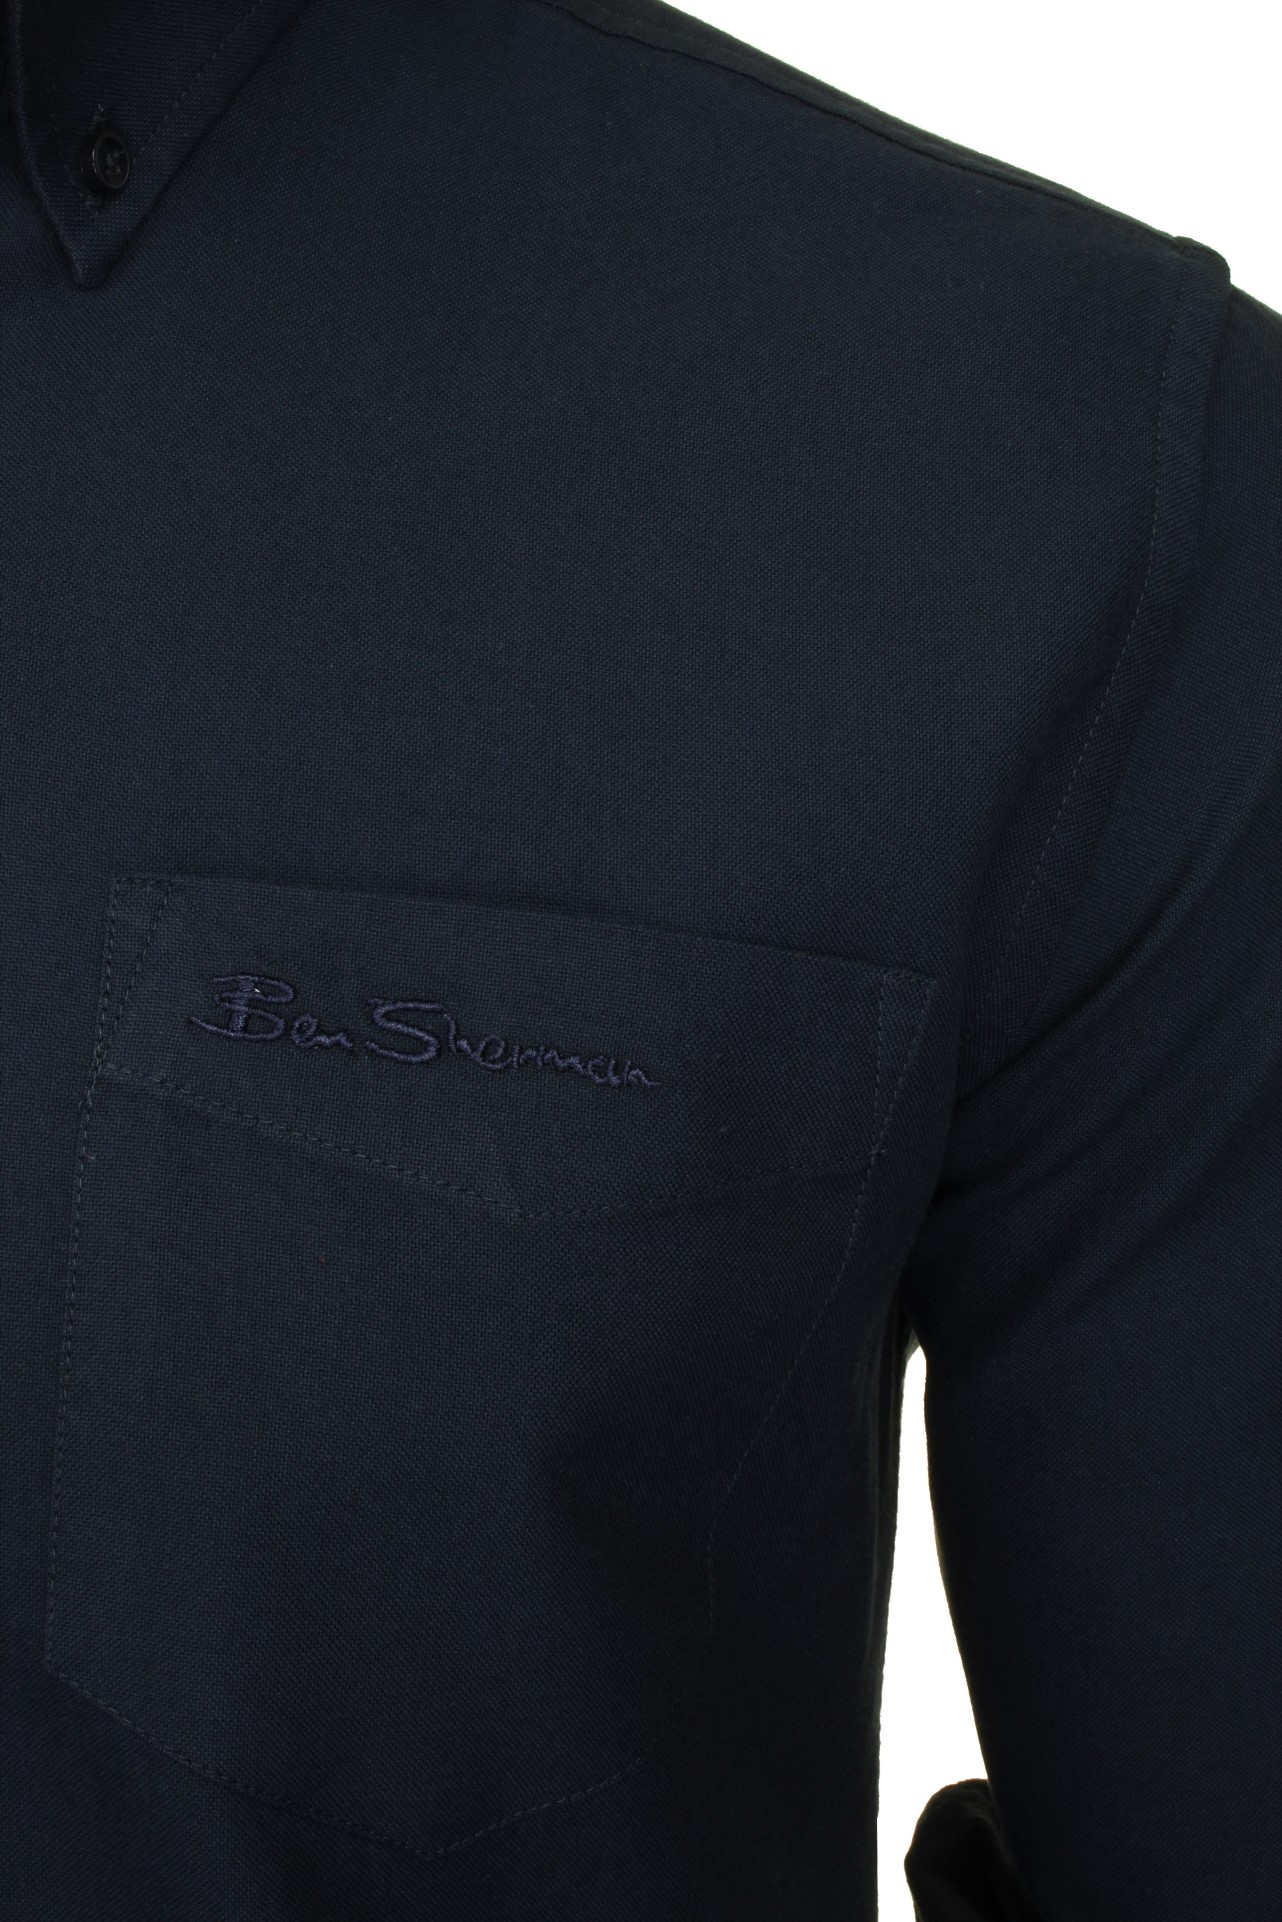 Mens-Oxford-Shirt-by-Ben-Sherman-Long-Sleeved thumbnail 17